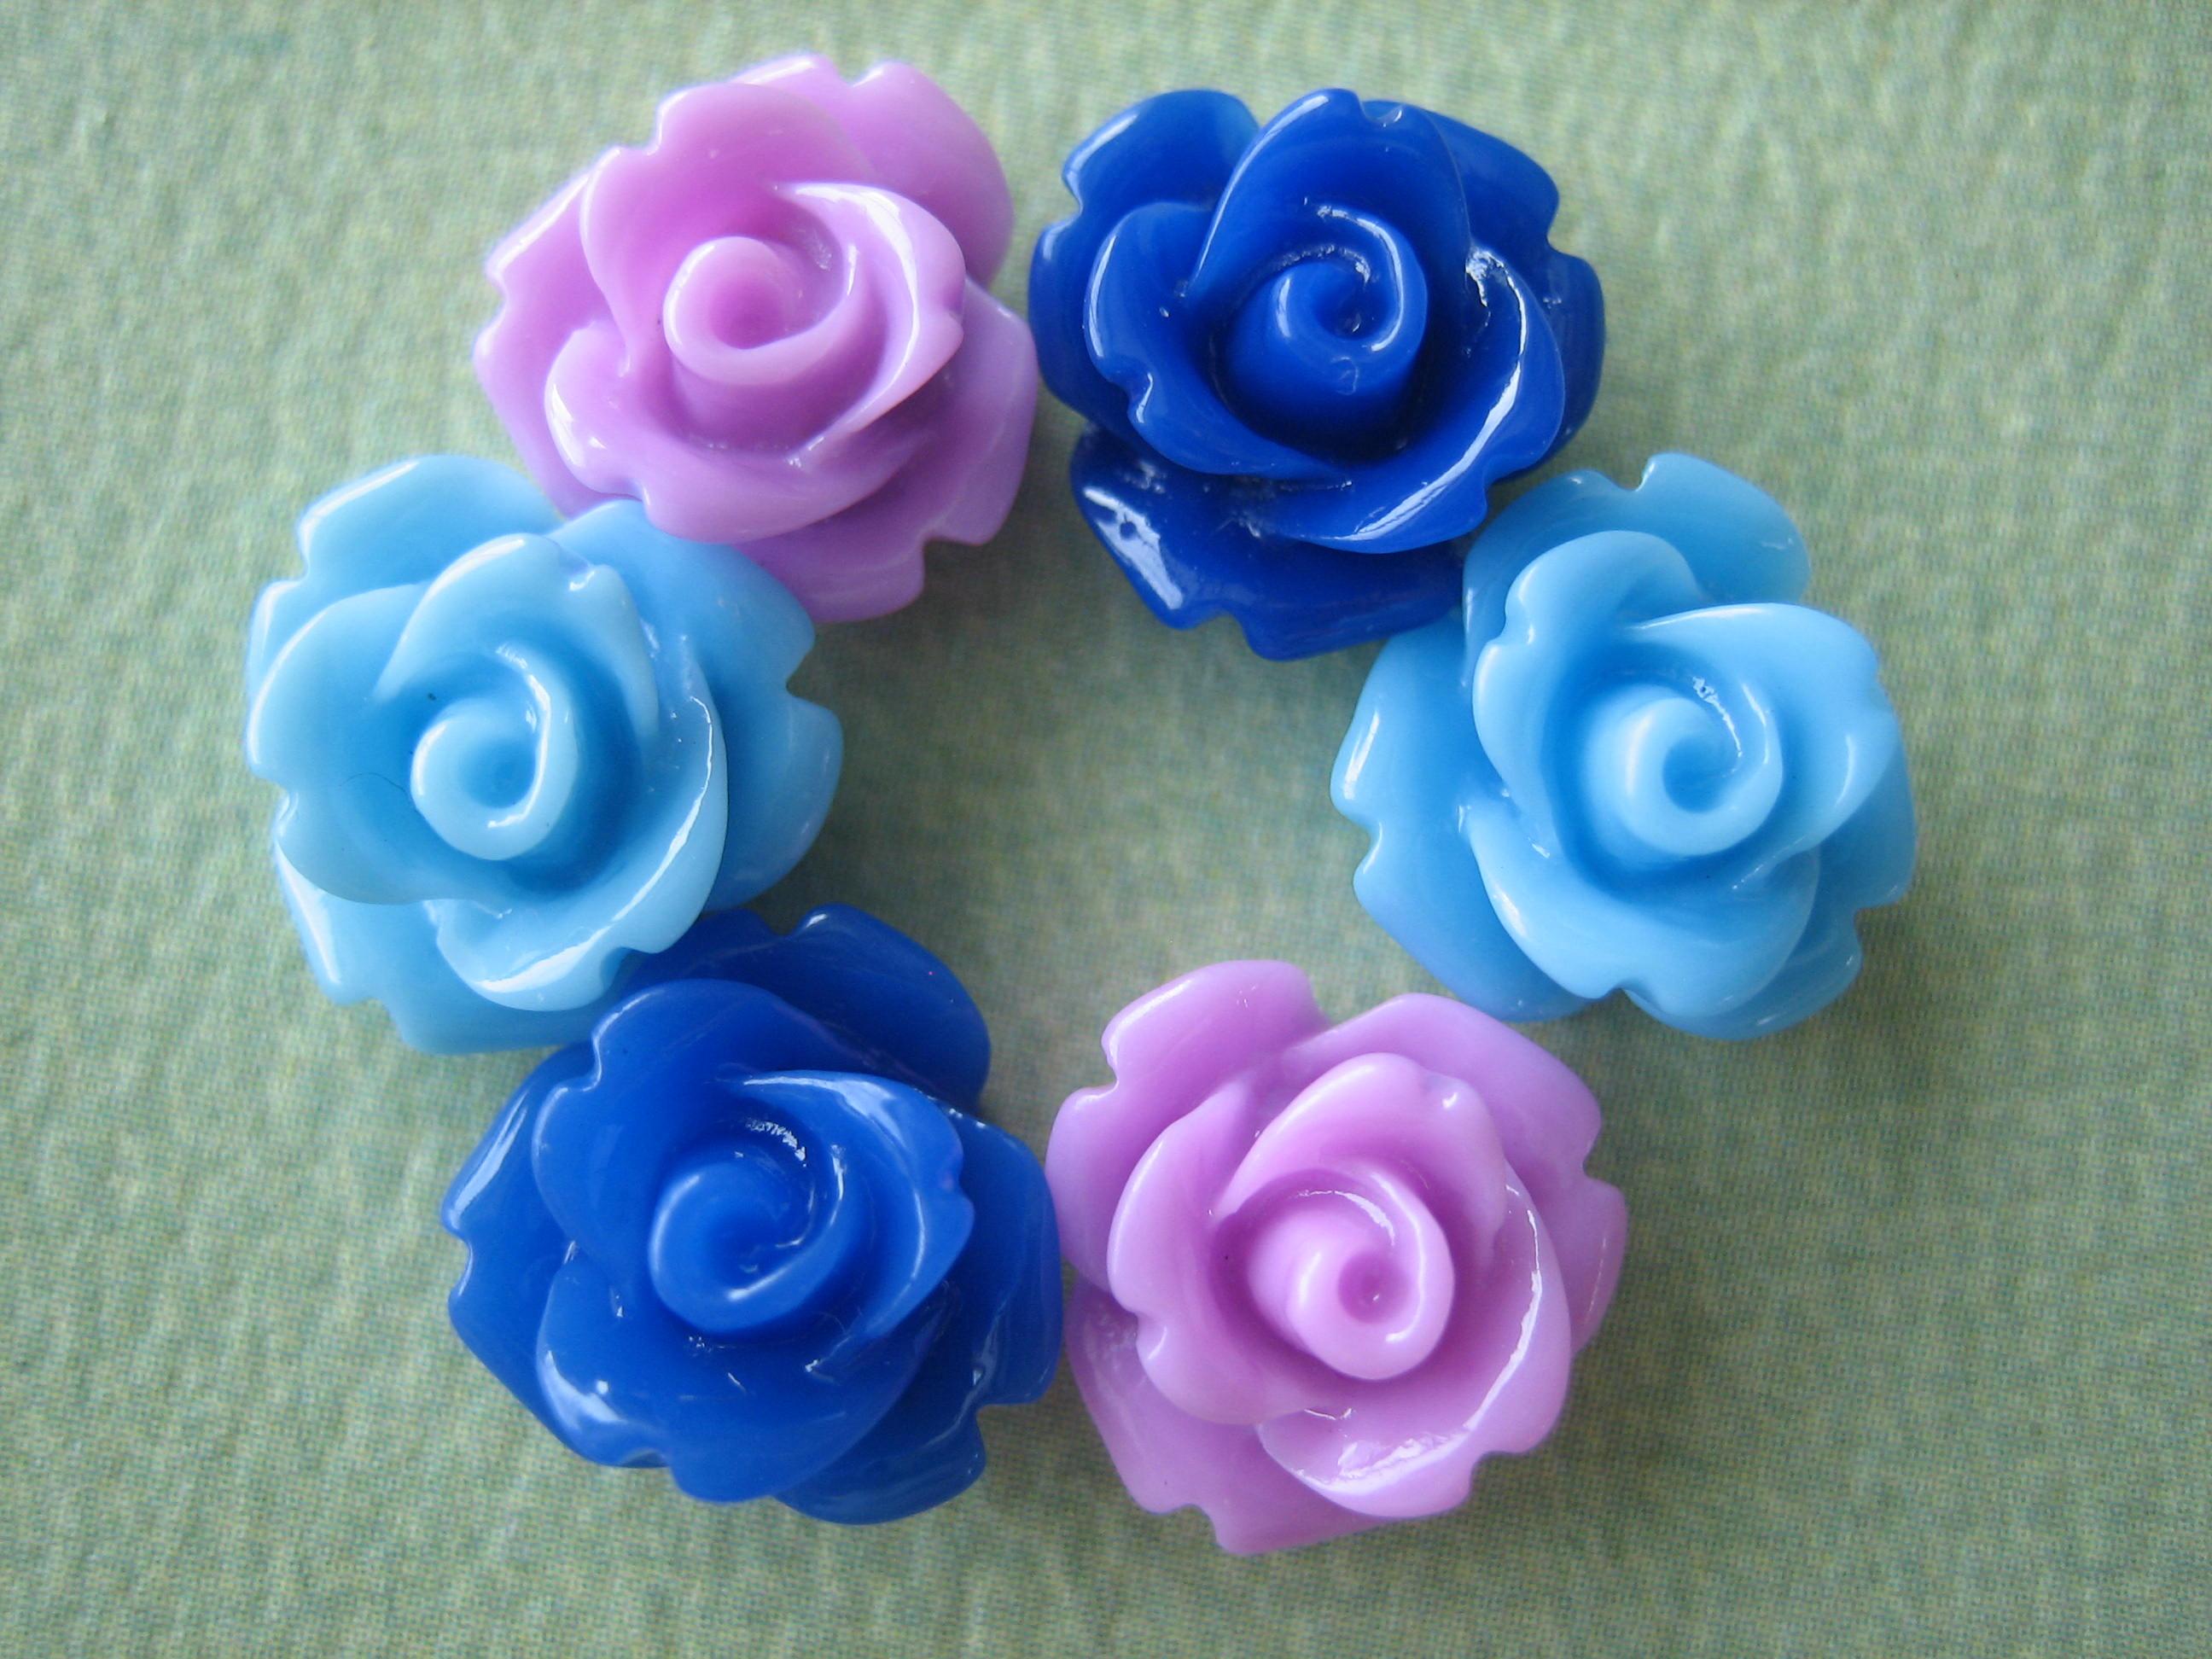 6pcs mini rose flower cabochons 10mm resin